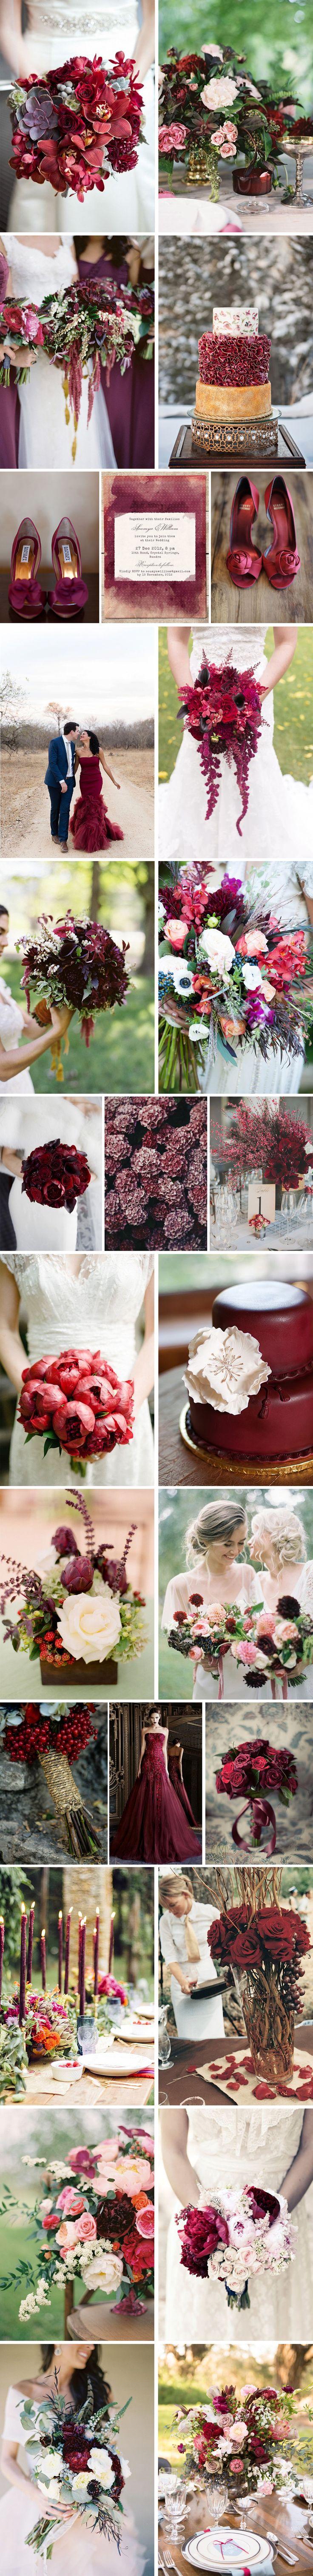 Pantone Color of 2015: Marsala wedding inspiration